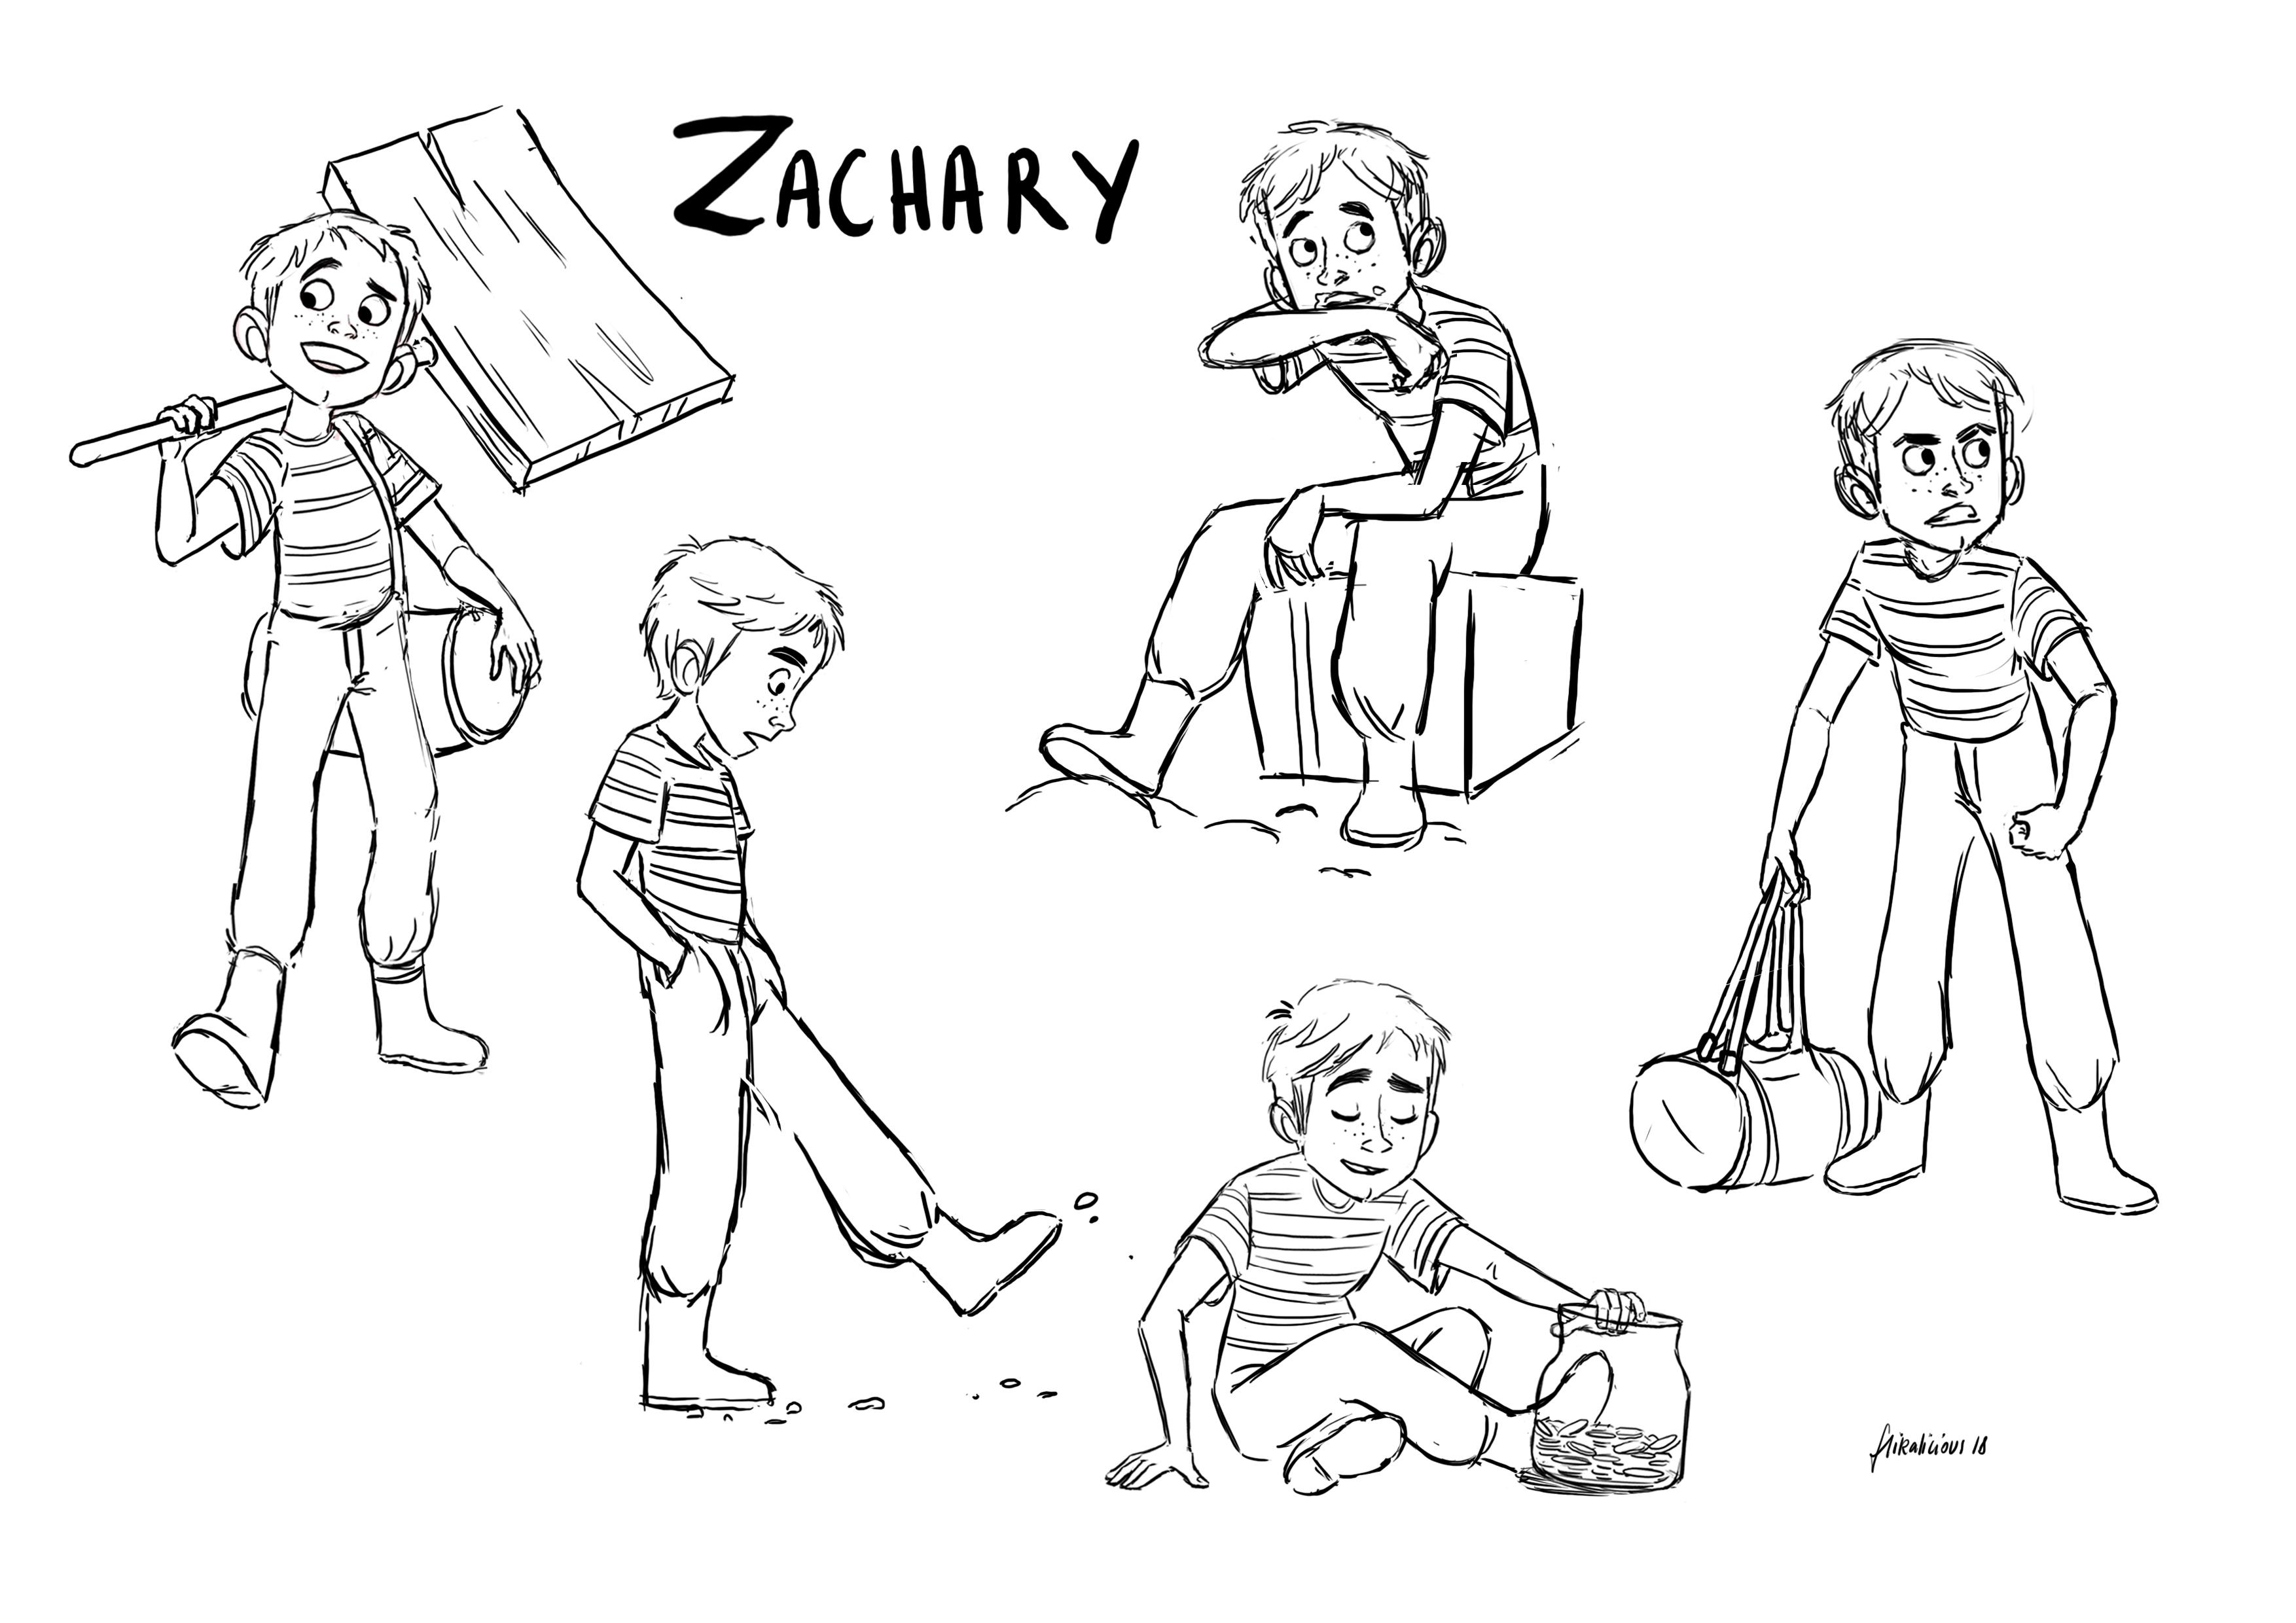 Flikalicious - CharaDesign - Zach